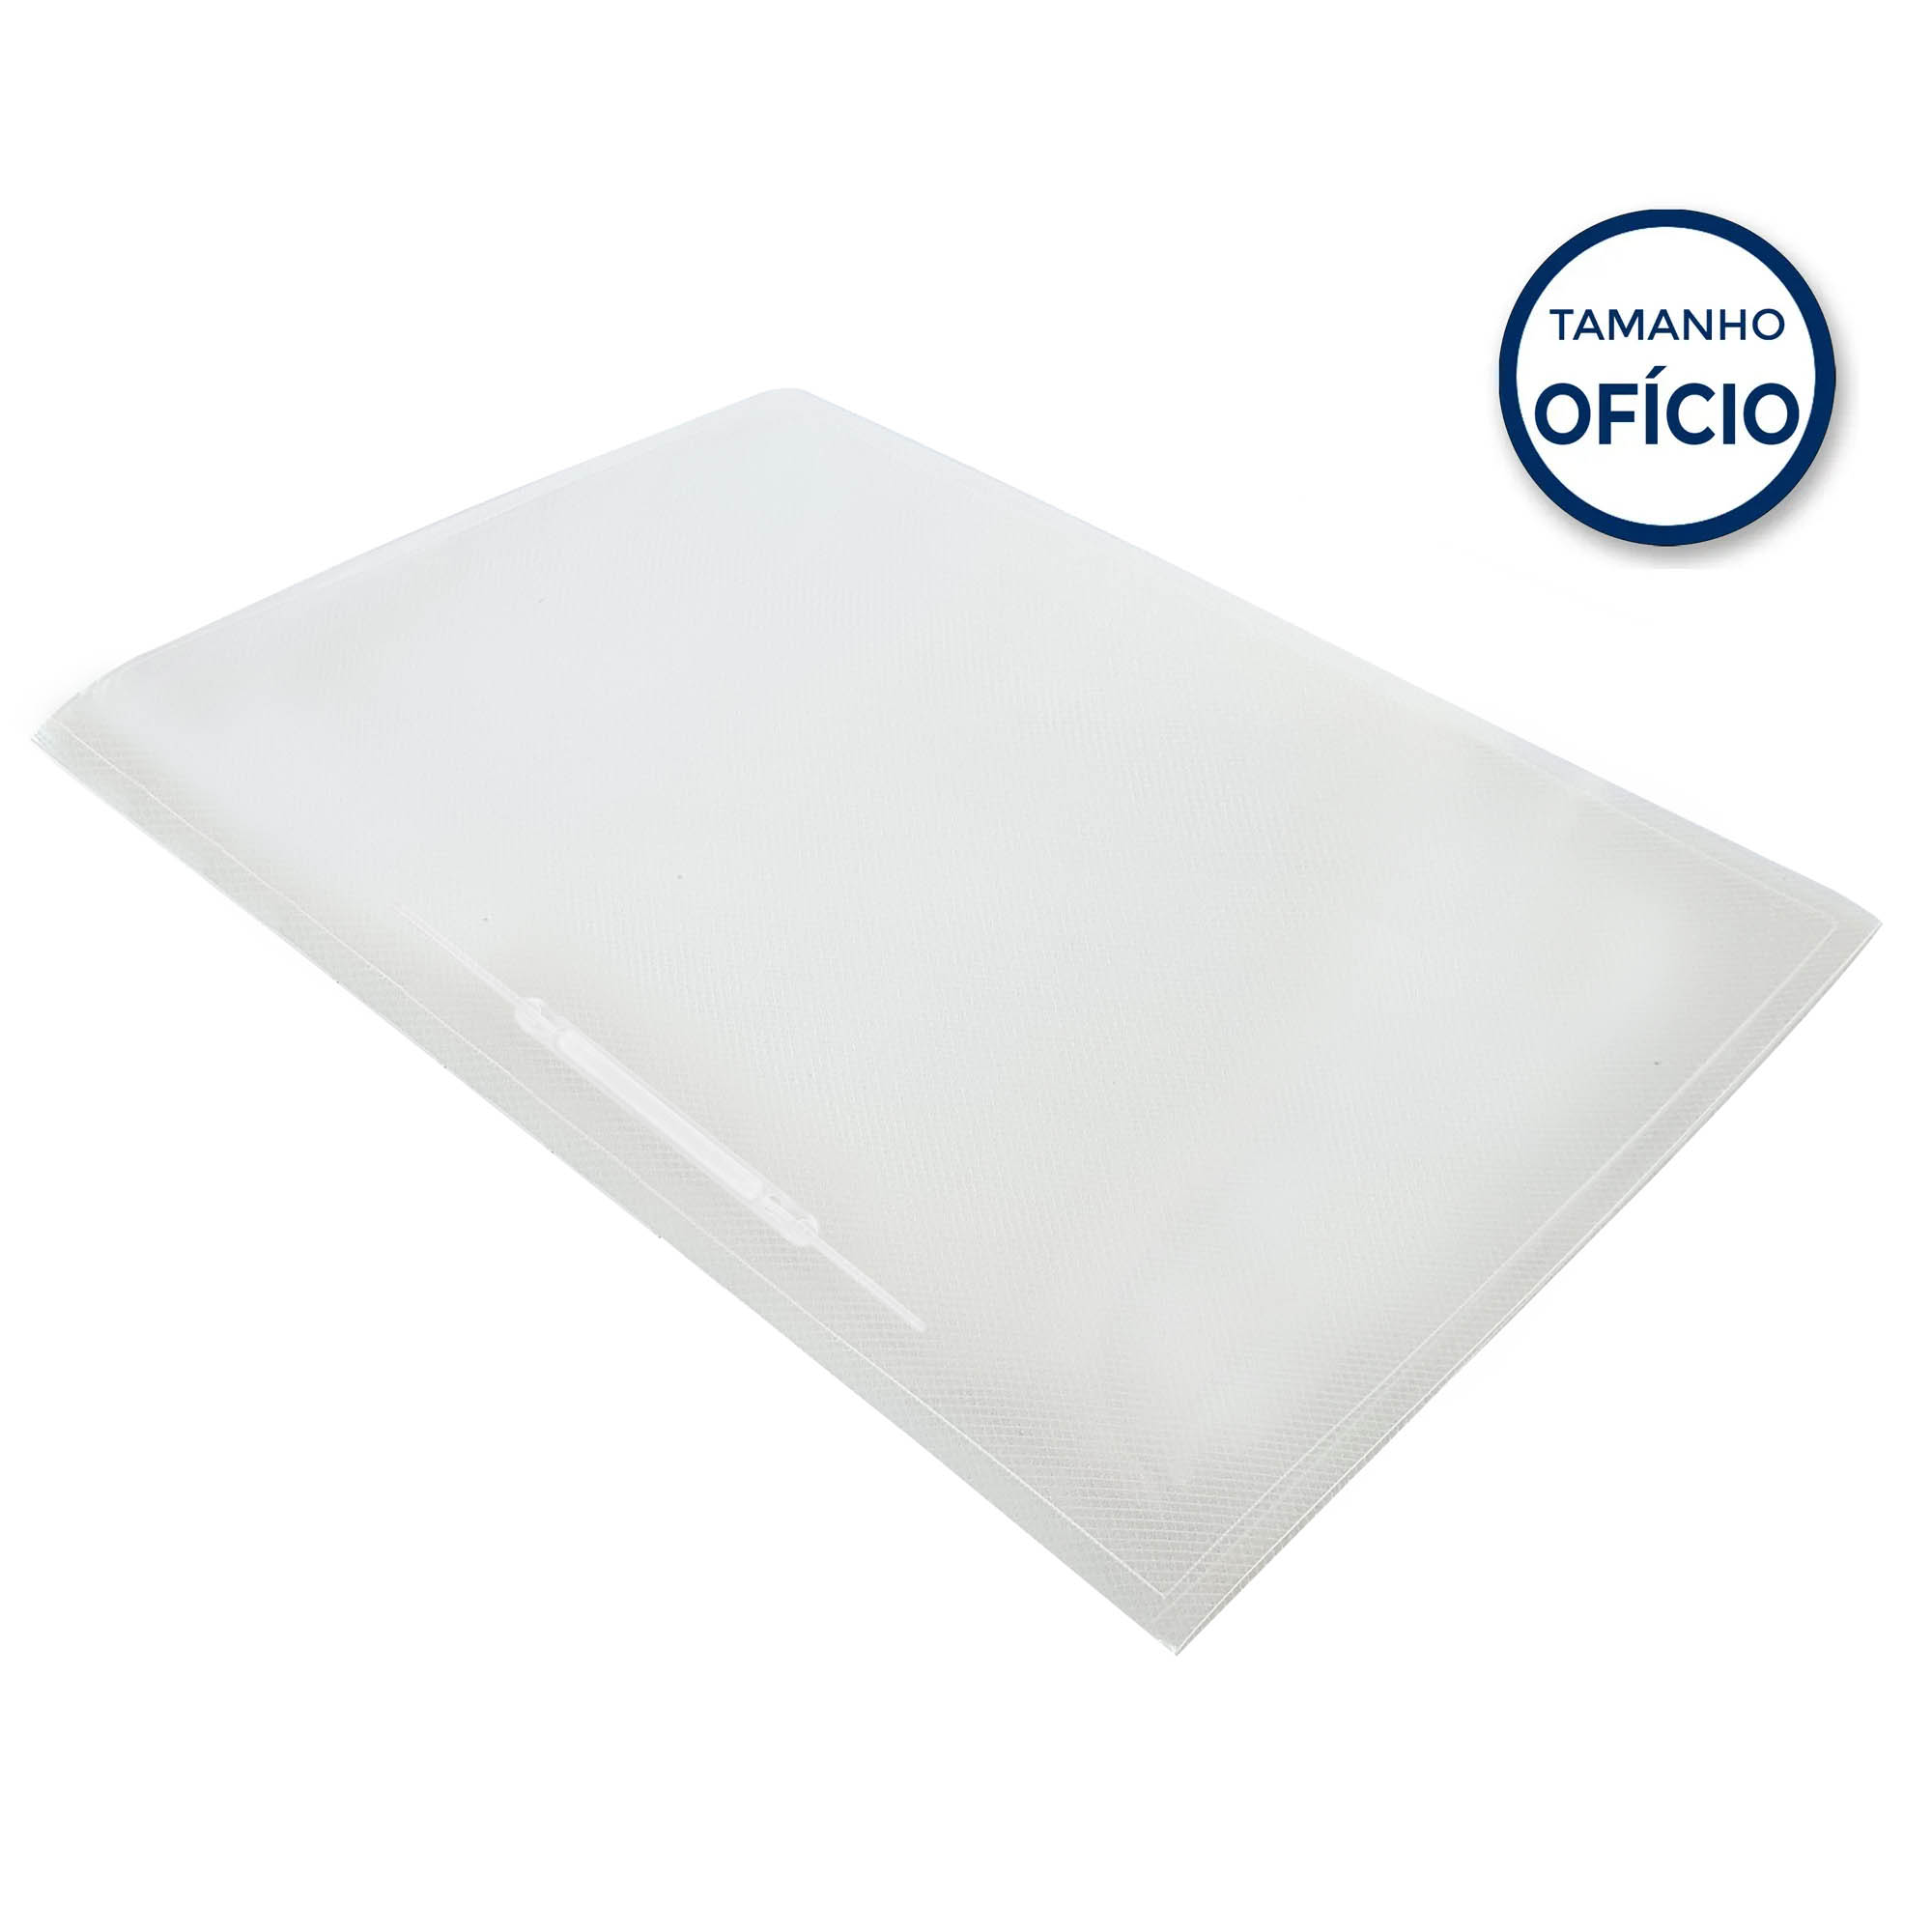 Pasta c/ Ferragem Soft Cor Cristal - Polibras